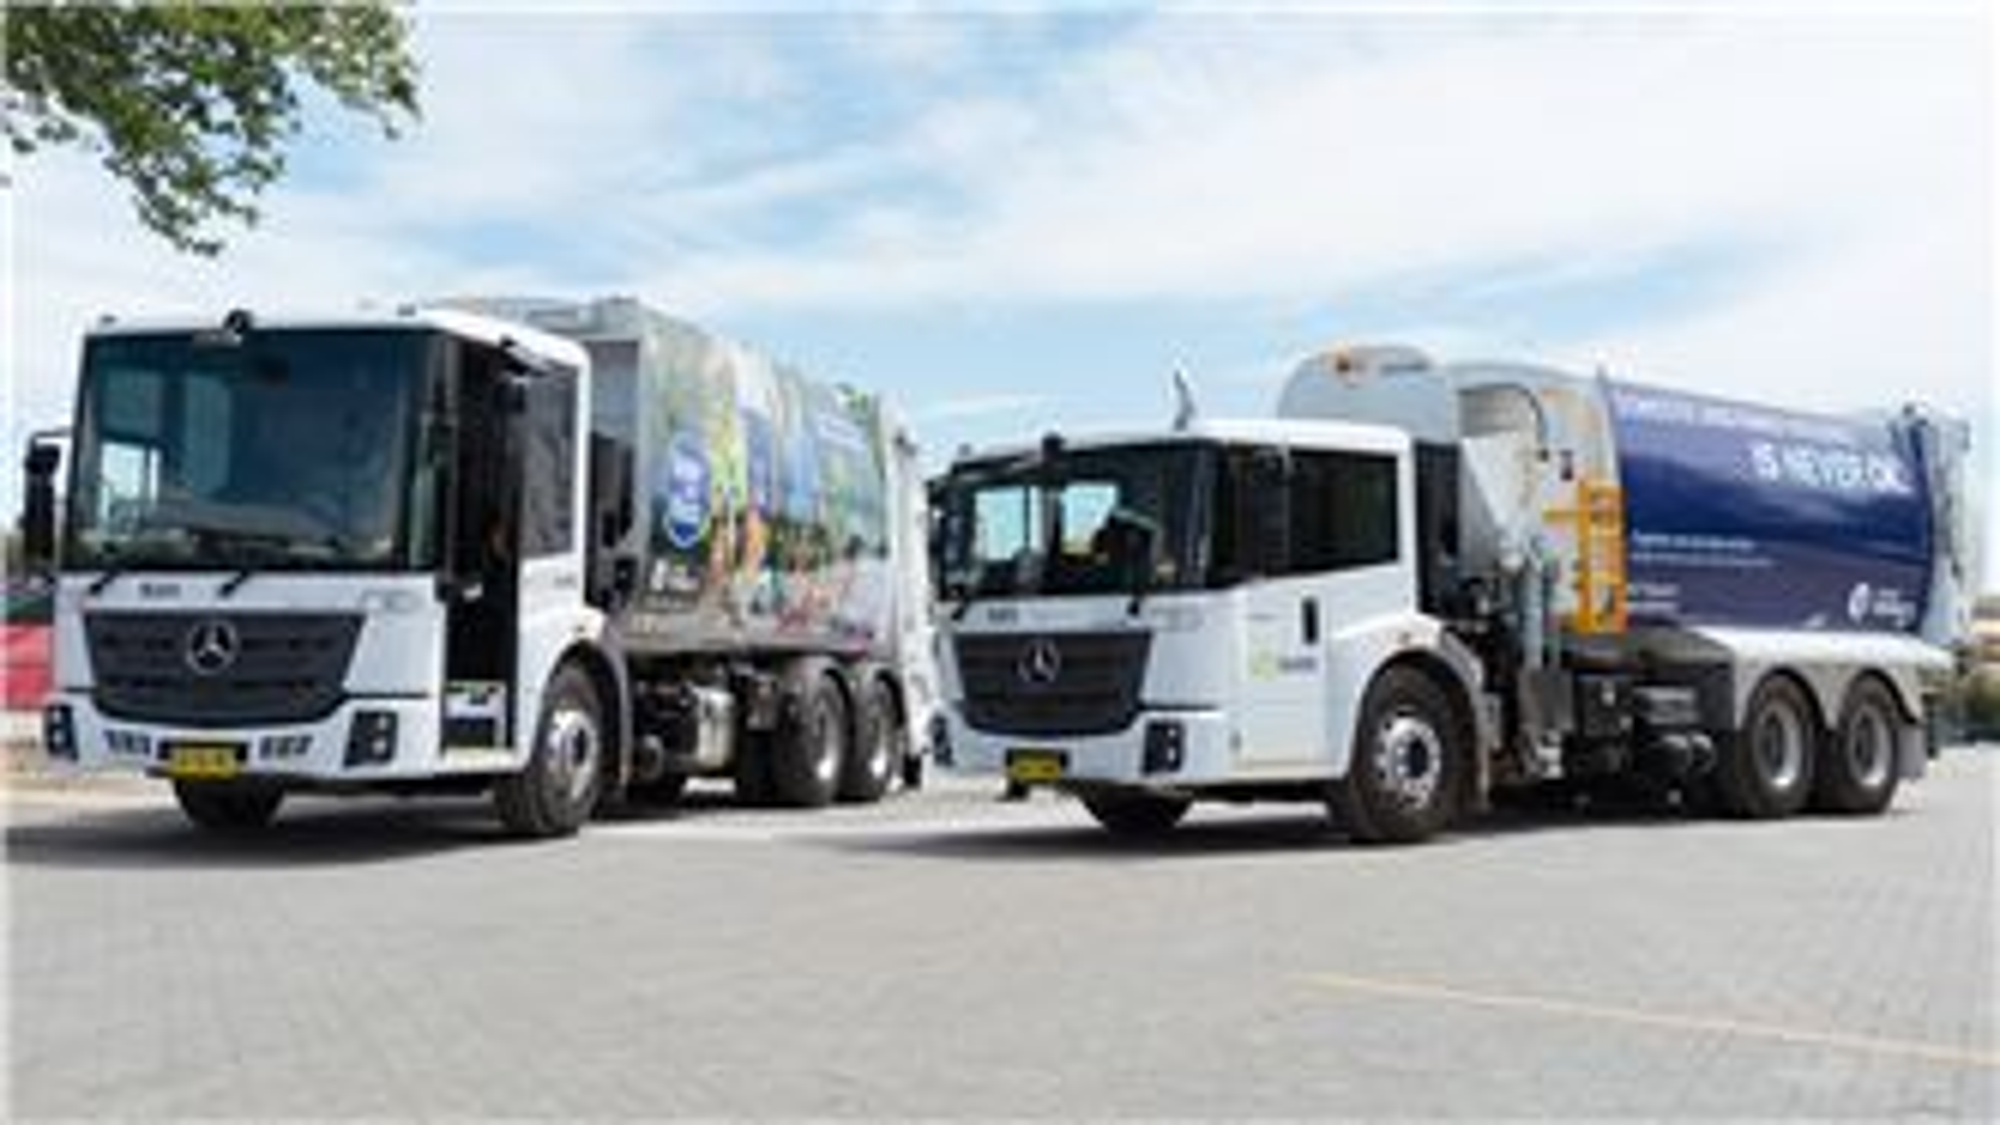 SUEZ Parramatta collections trucks with community messages